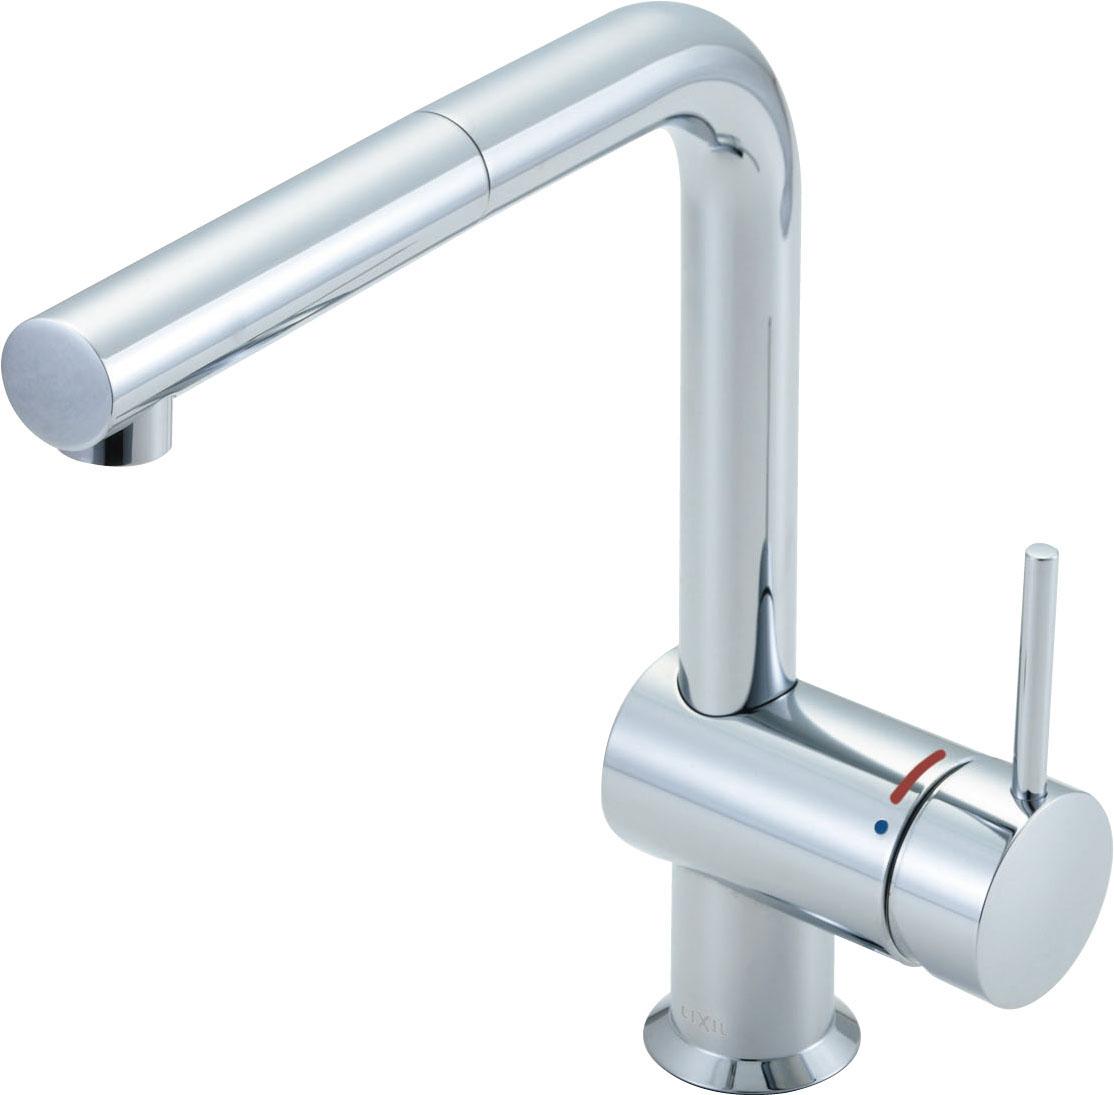 INAX LIXIL キッチン水栓 SF-E546SY 吐水口引出式水栓 ワンホールタイプ ホース引出しタイプ eモダン Lタイプ (エコハンドル) イナックス・リクシル